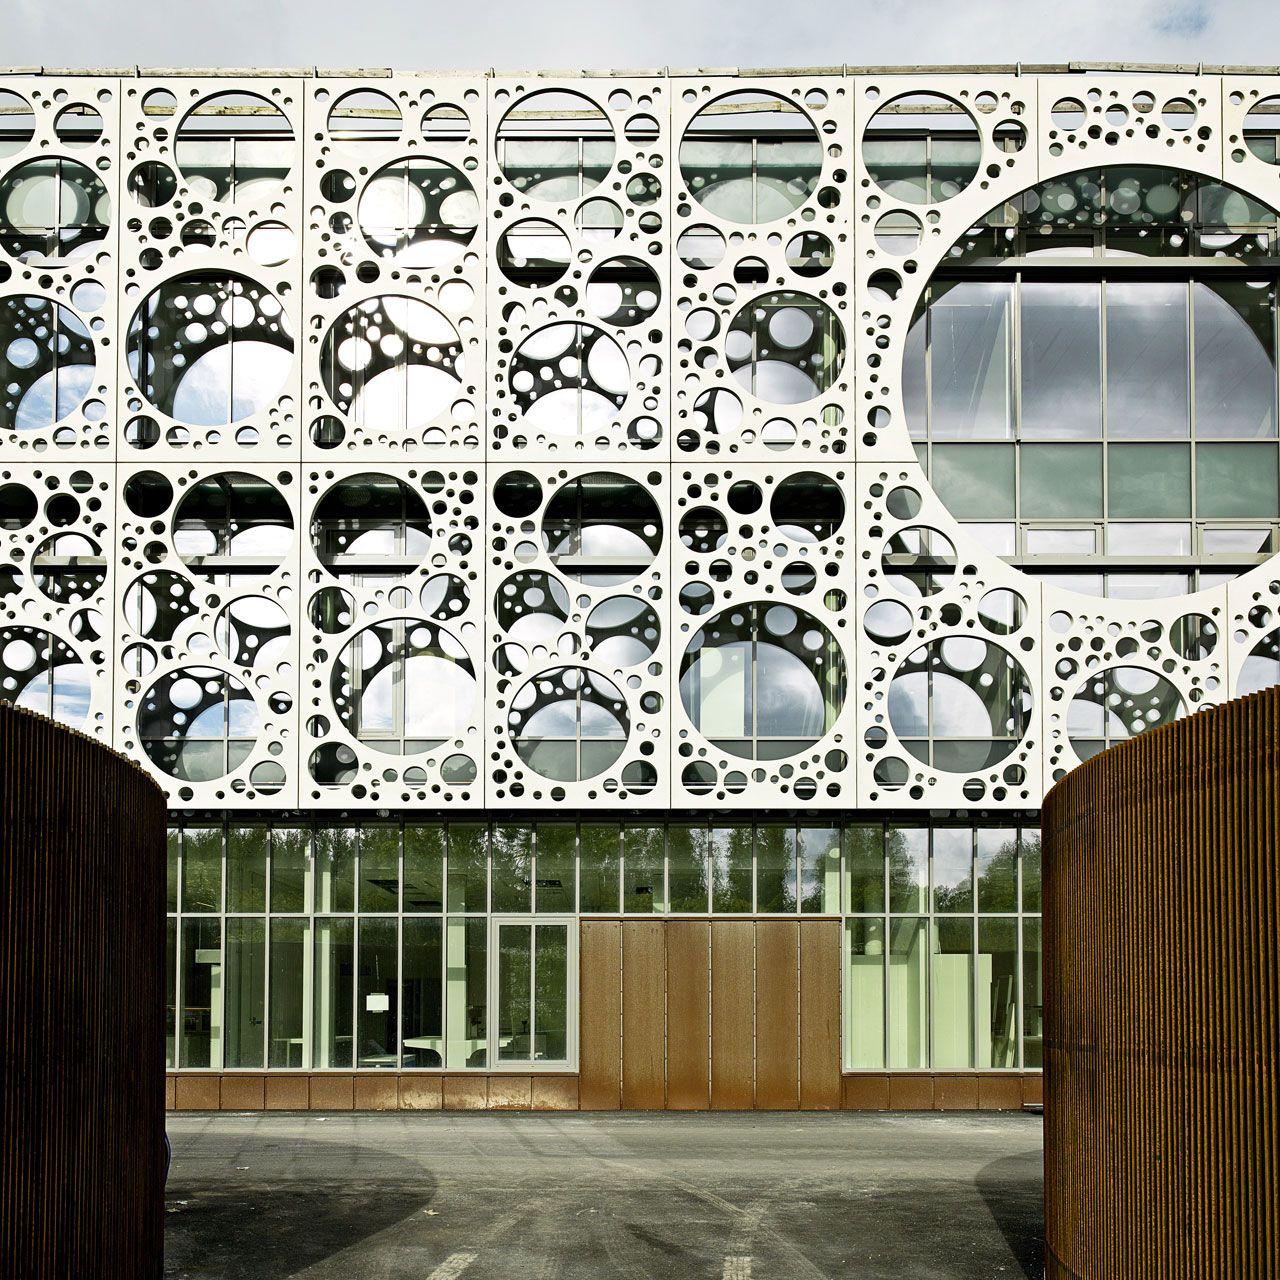 C. F. Møller Architects, Technical Faculty, University of Southern Denmark, Odense, Denmark